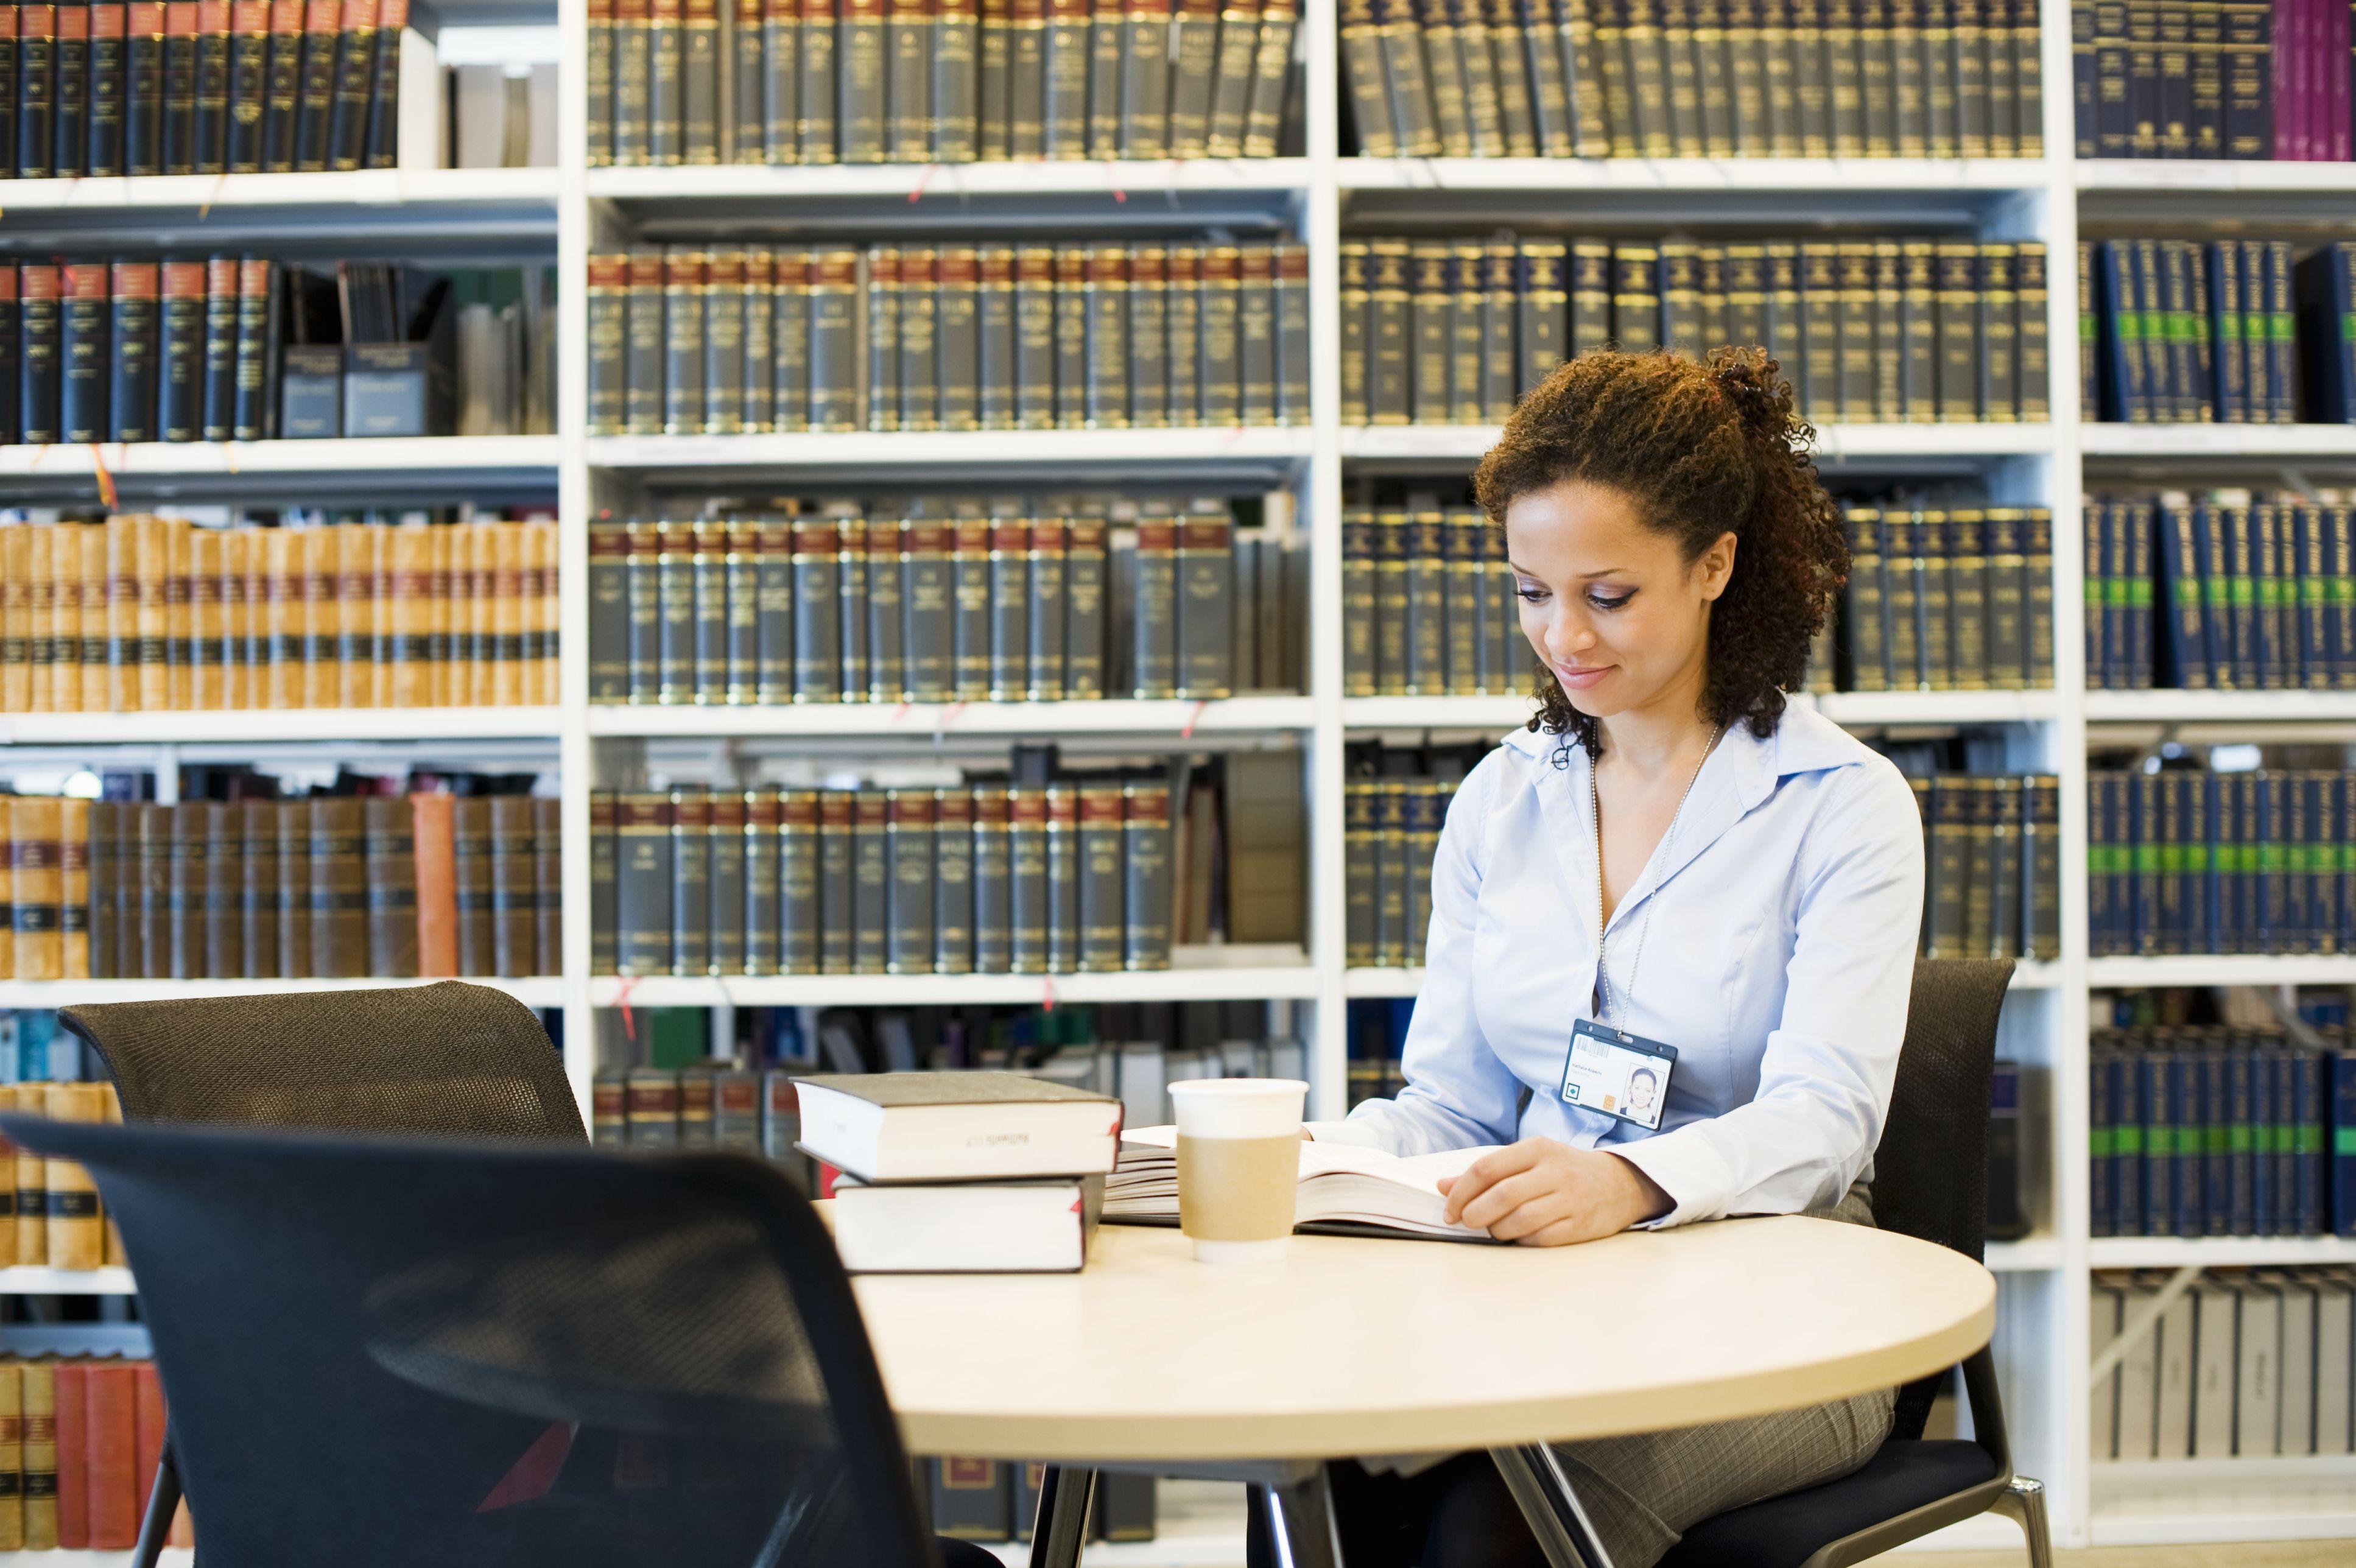 law-student-Dave---Les-Jacobs-56a44a0a3df78cf7728197e8